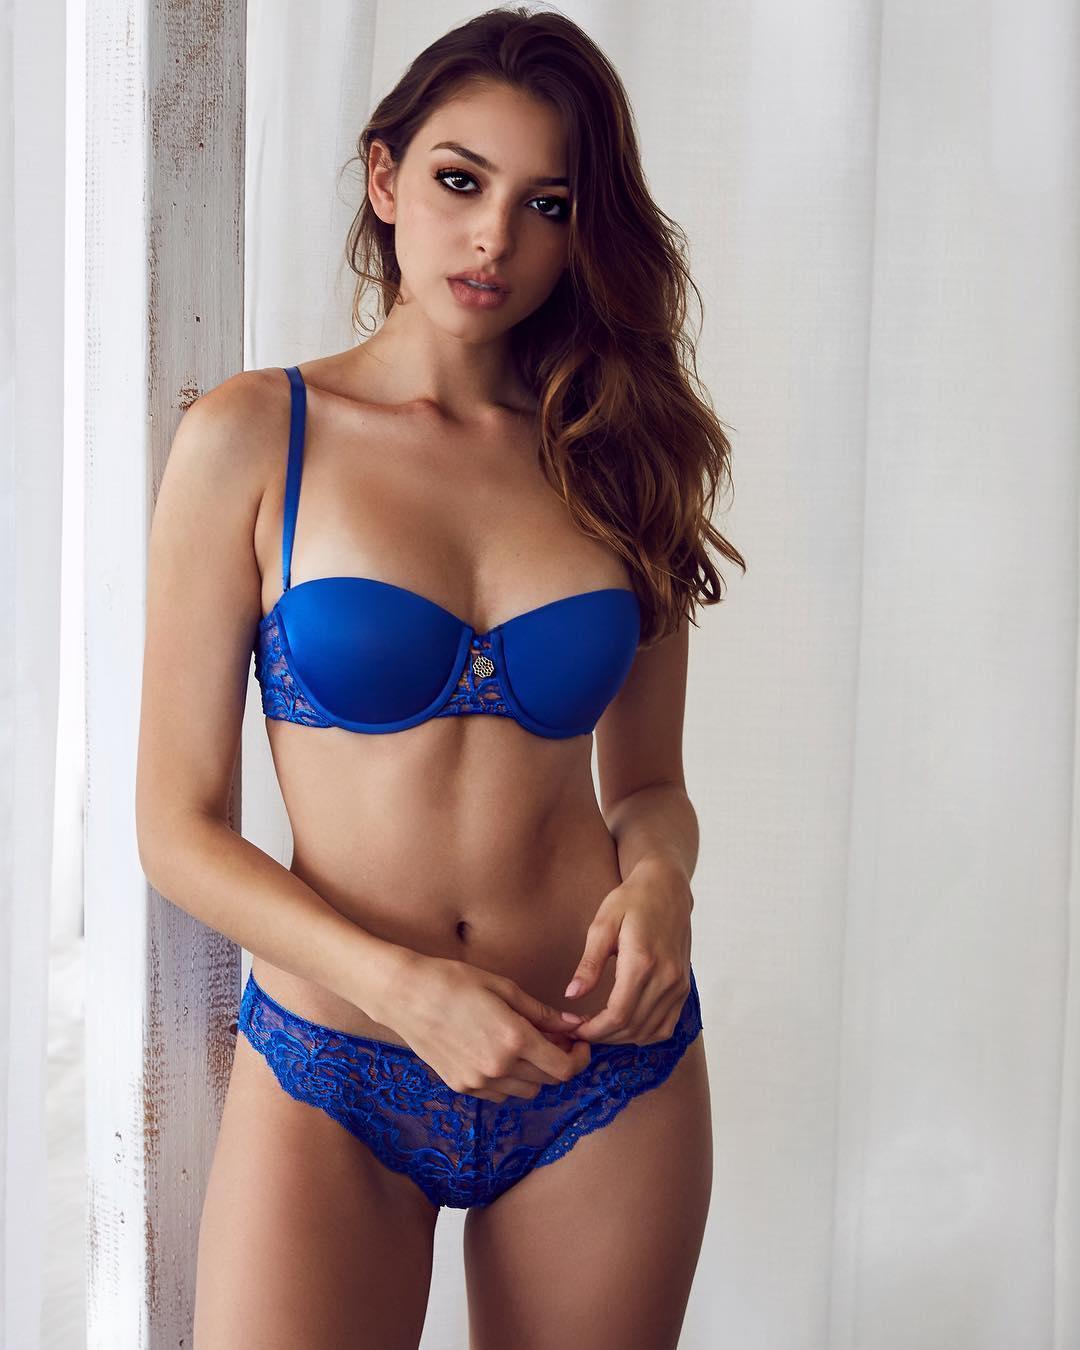 Too beautiful American model Celine Farrakhan014